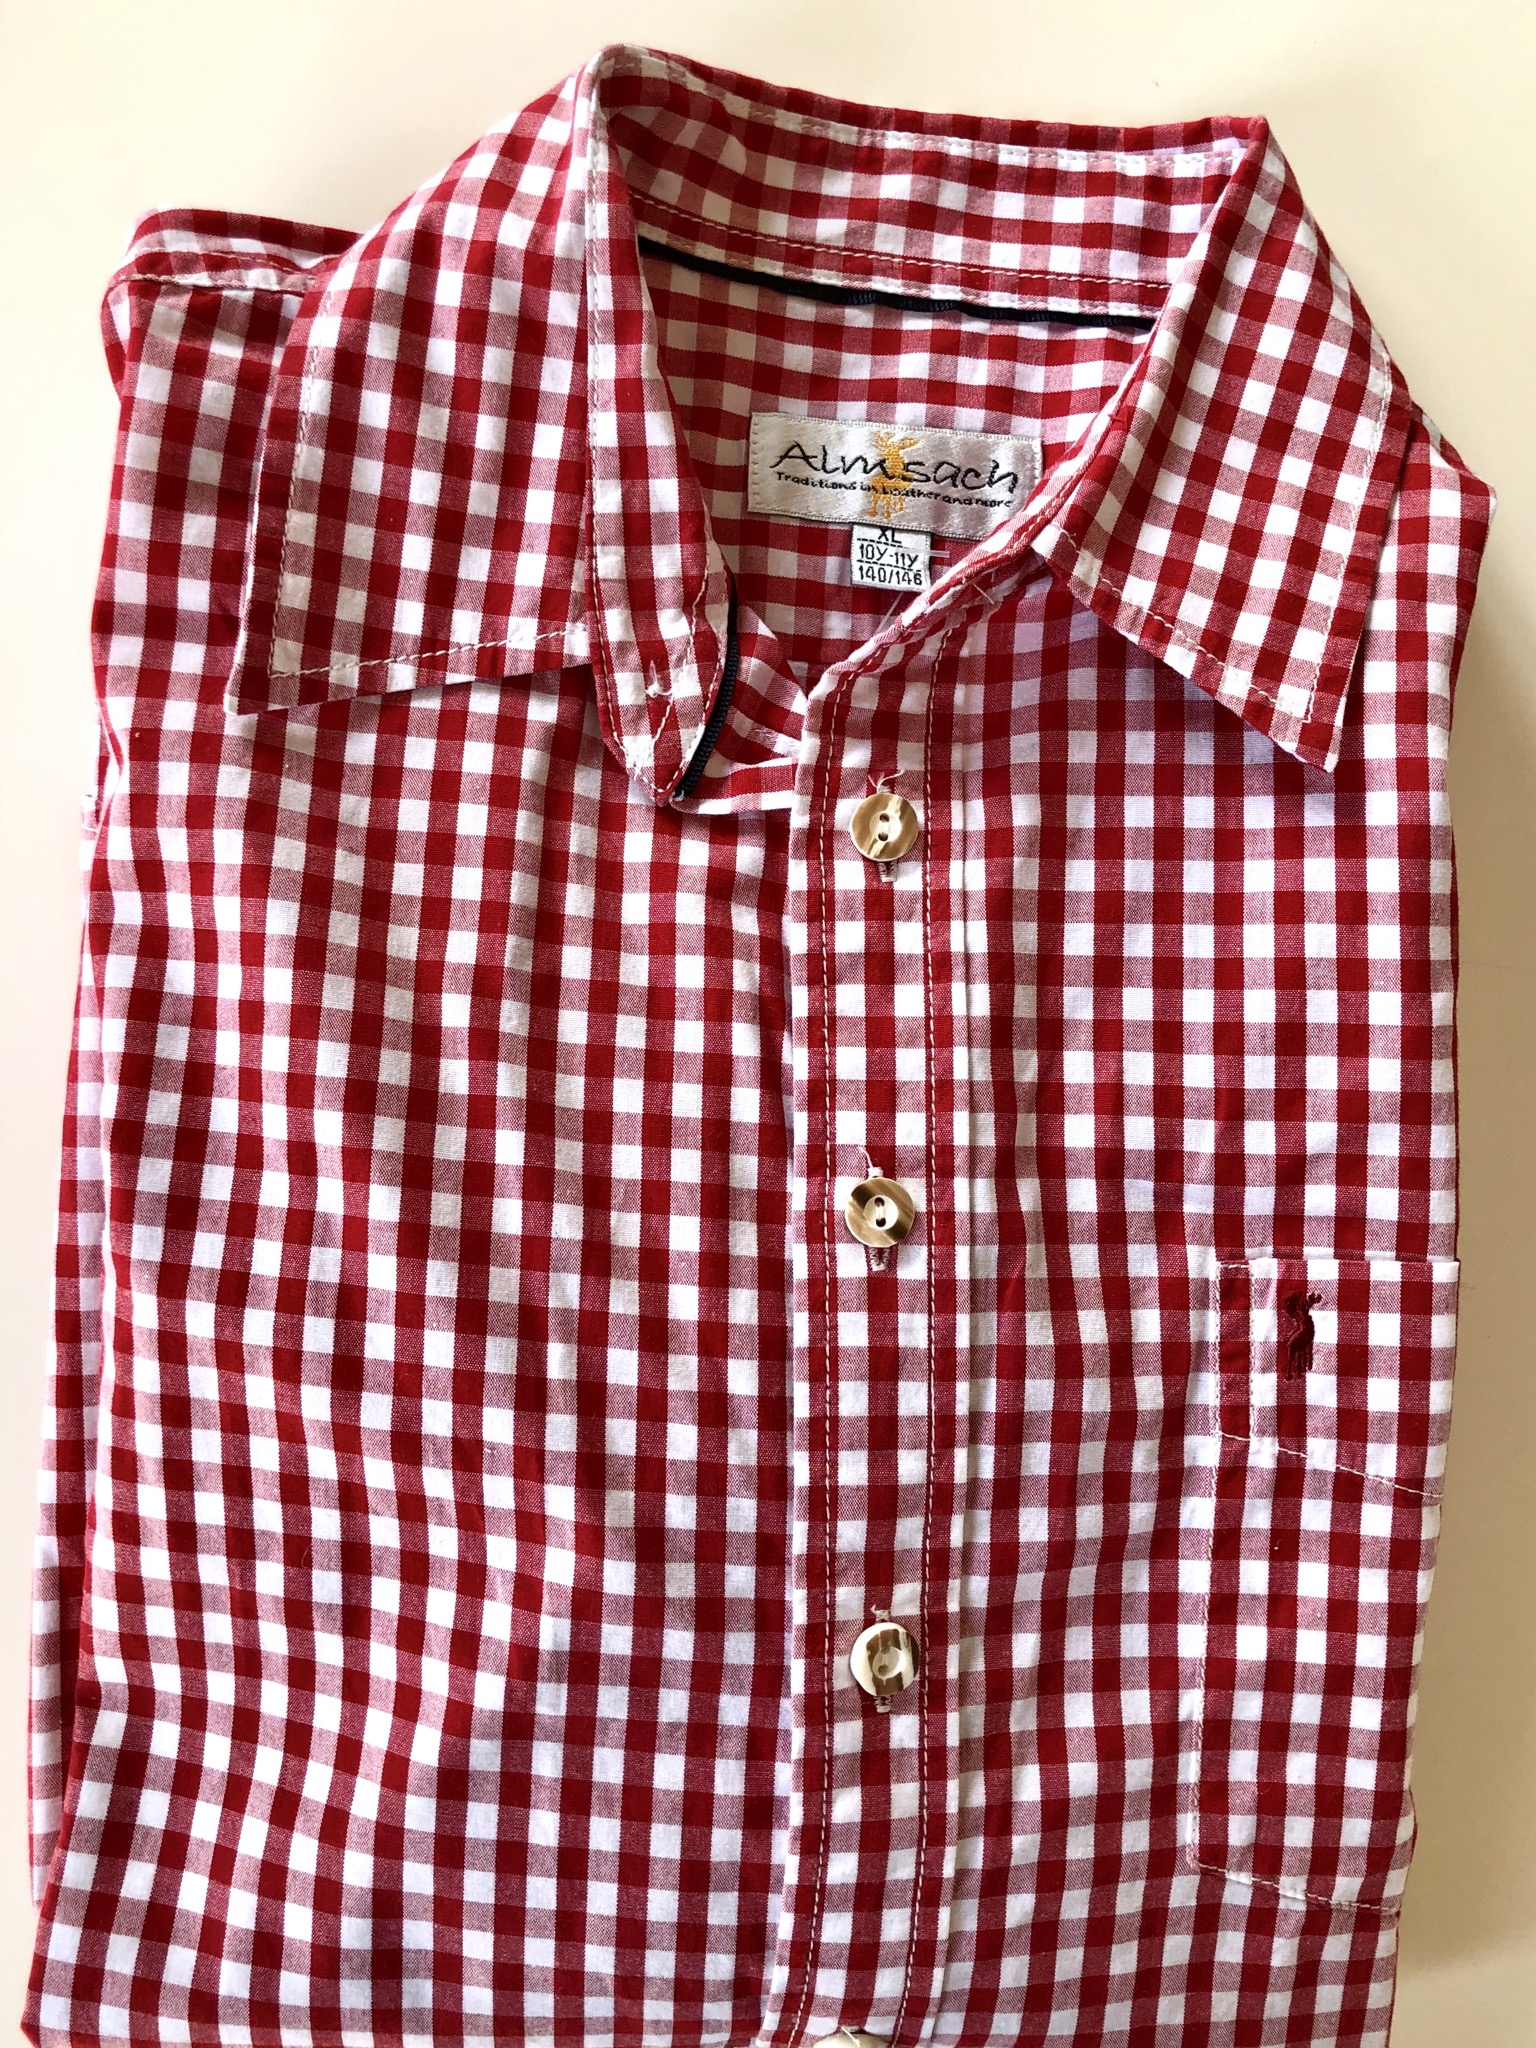 Gr. 140-146 Almsach Trachtenhemd rot